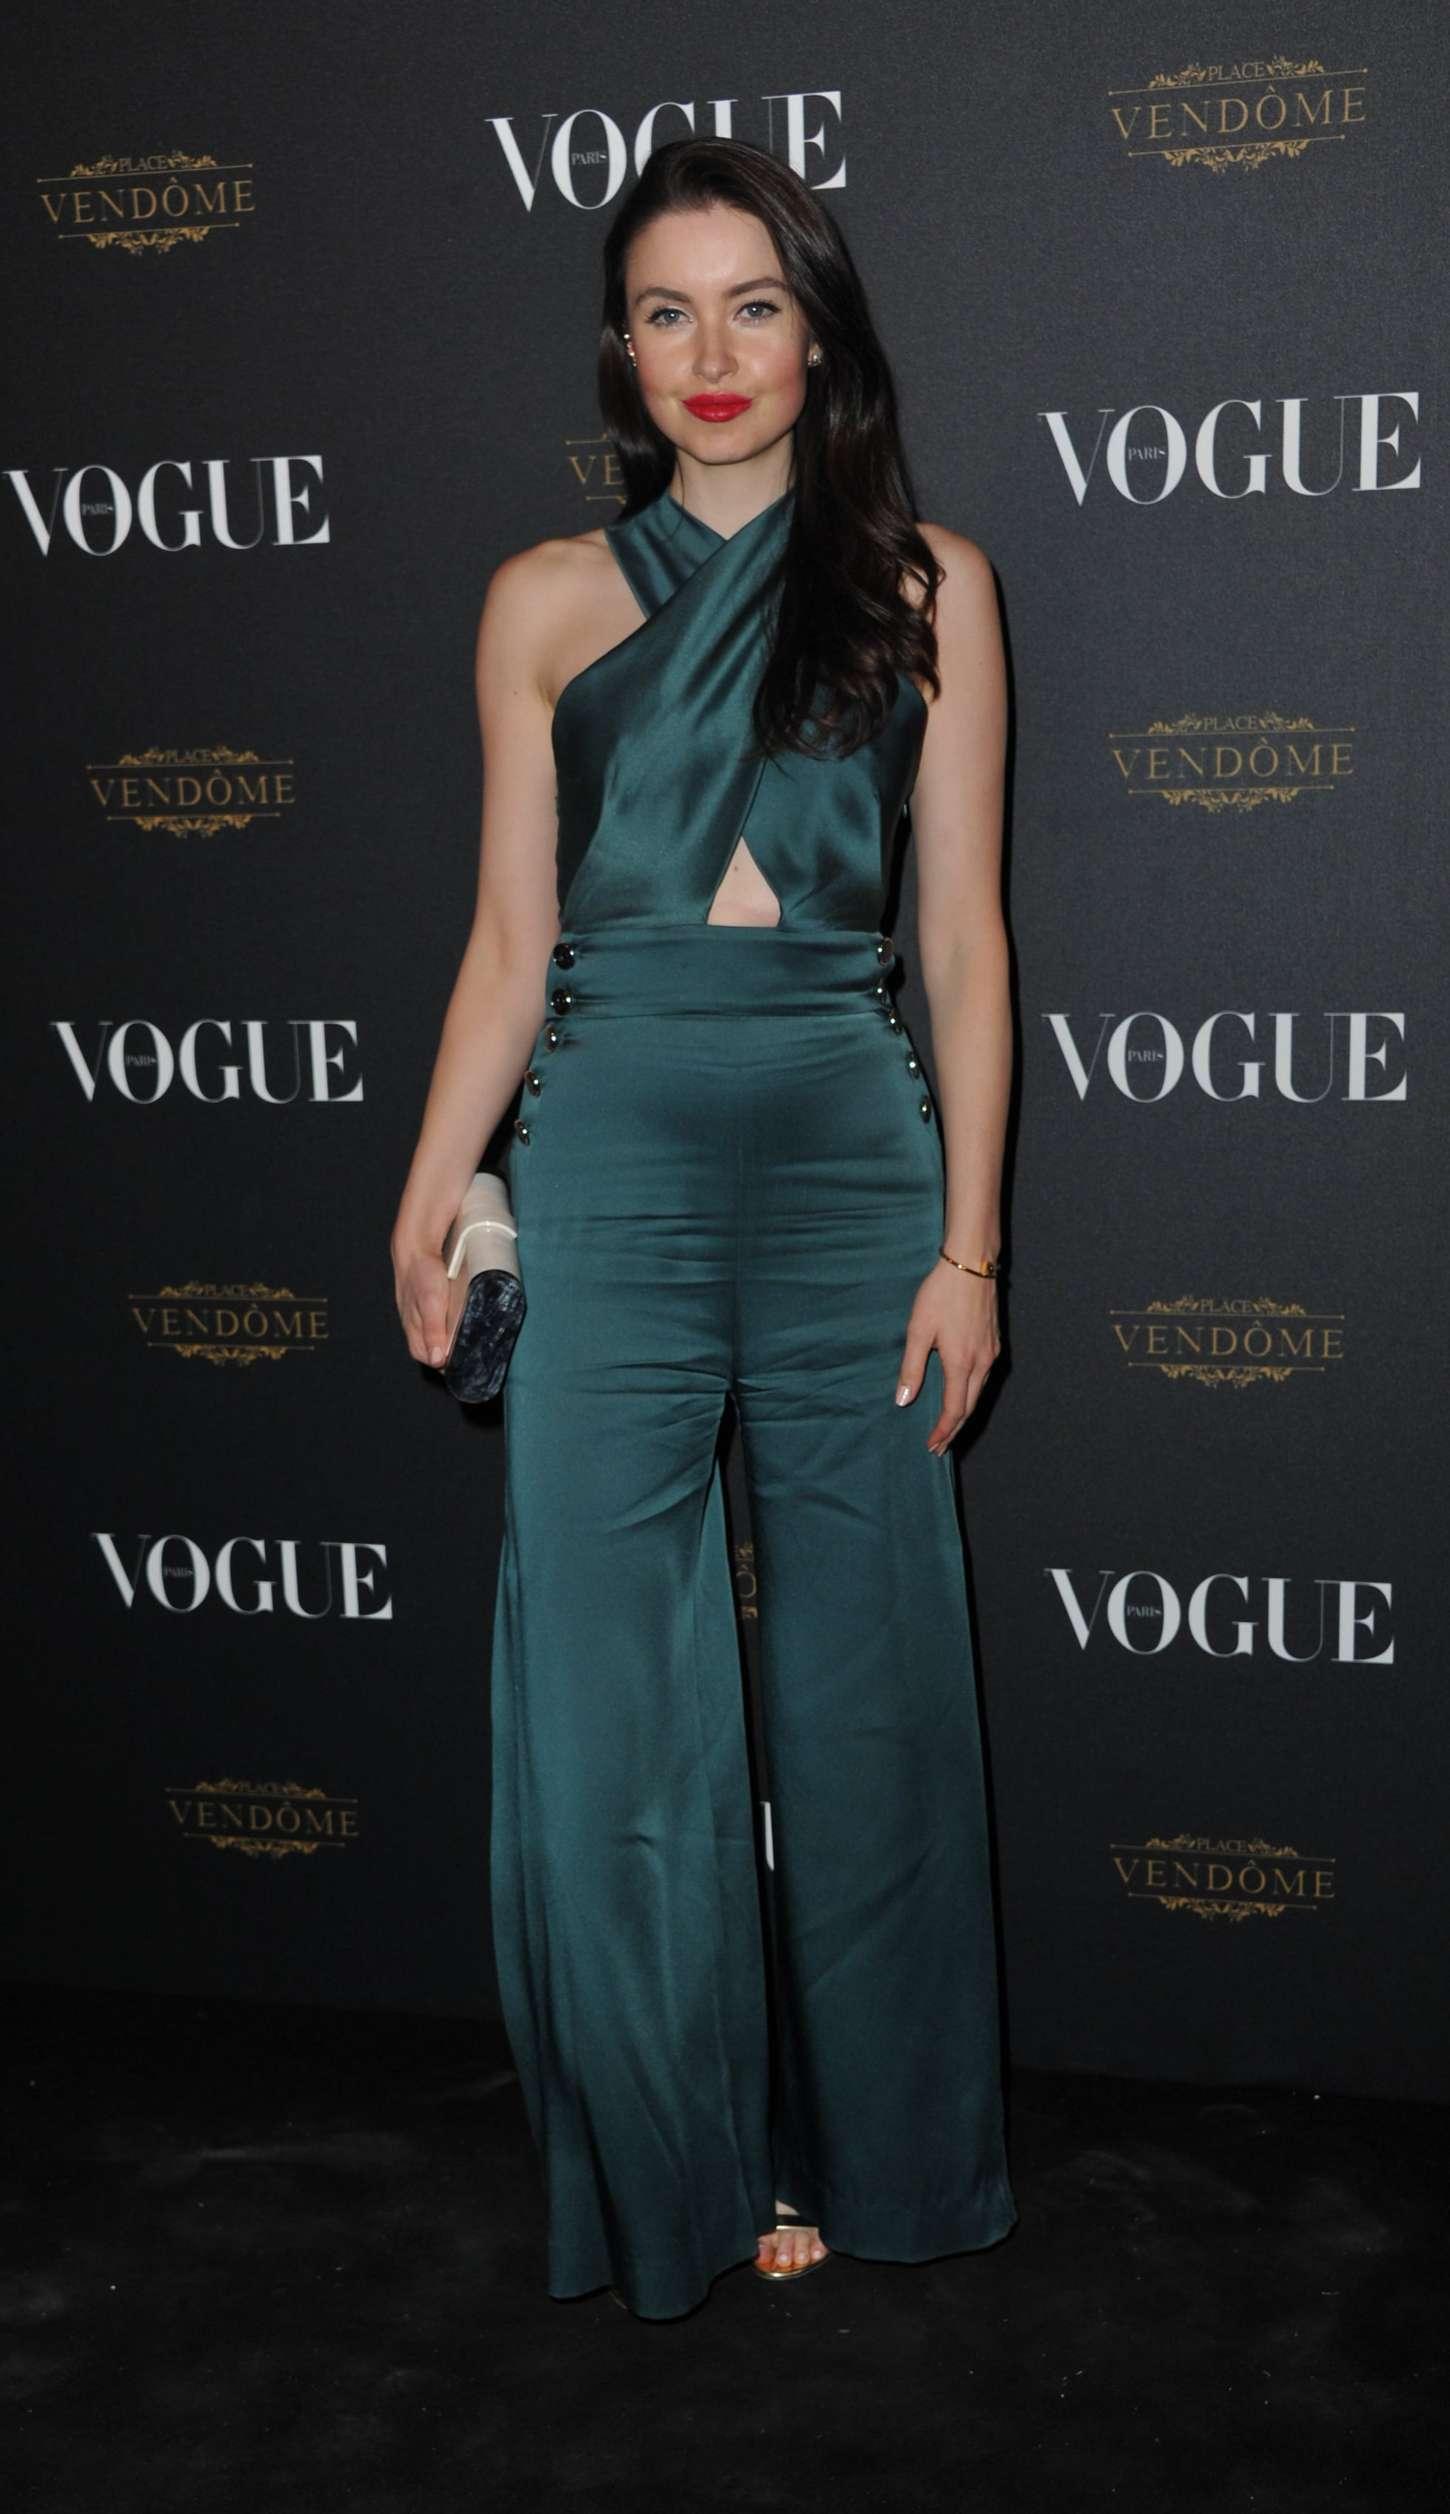 Emma Miller - Vogue 95th Anniversary Party in Paris